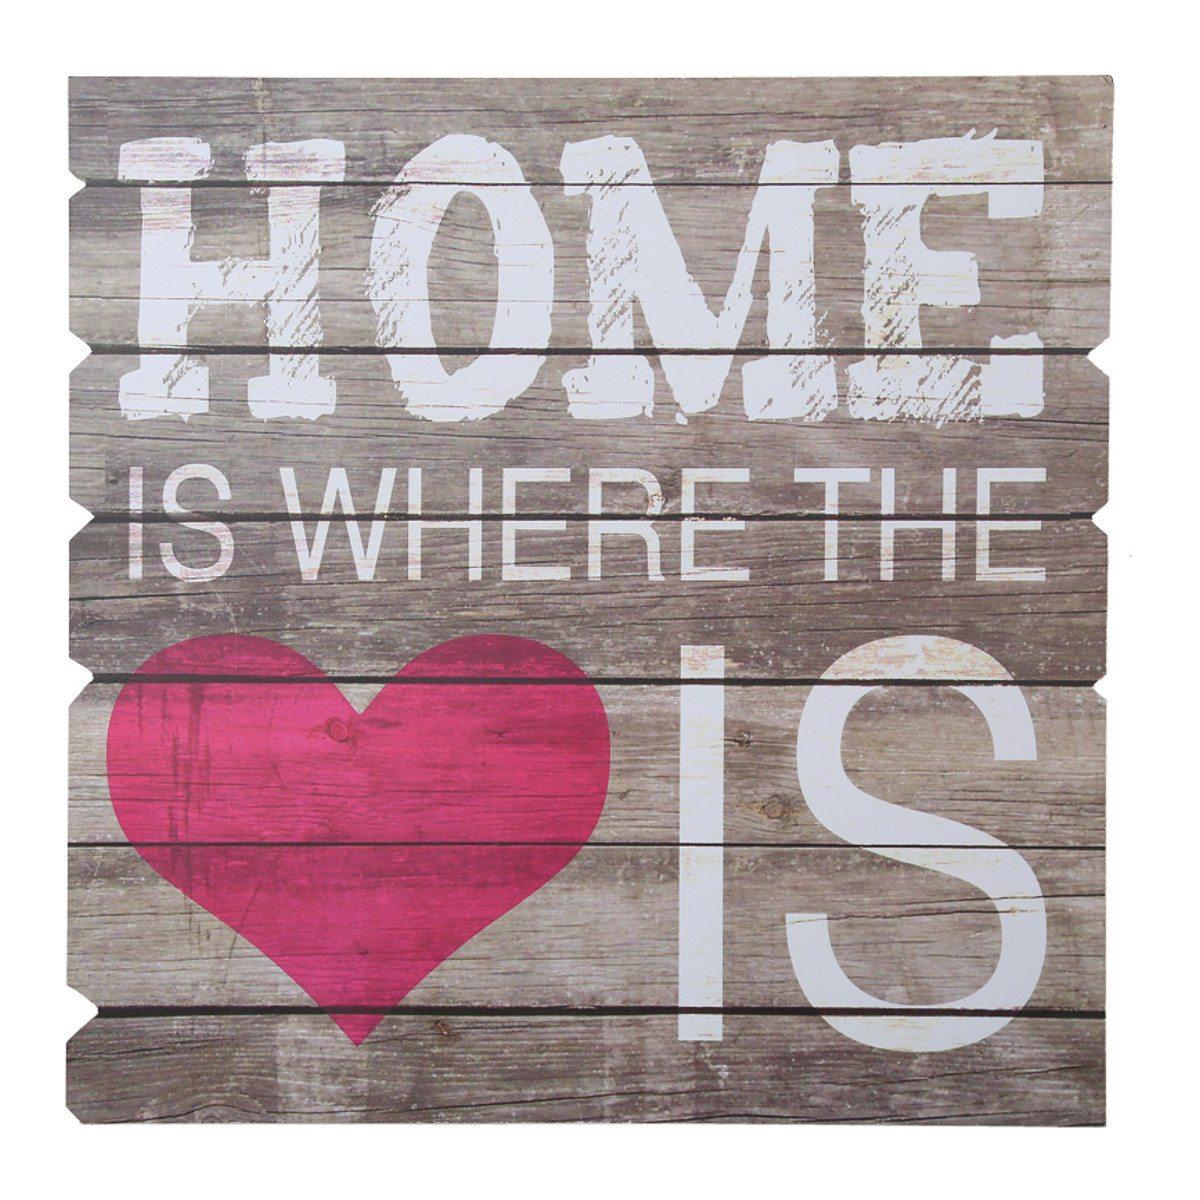 Home Is Where The Heart Is - træskilt